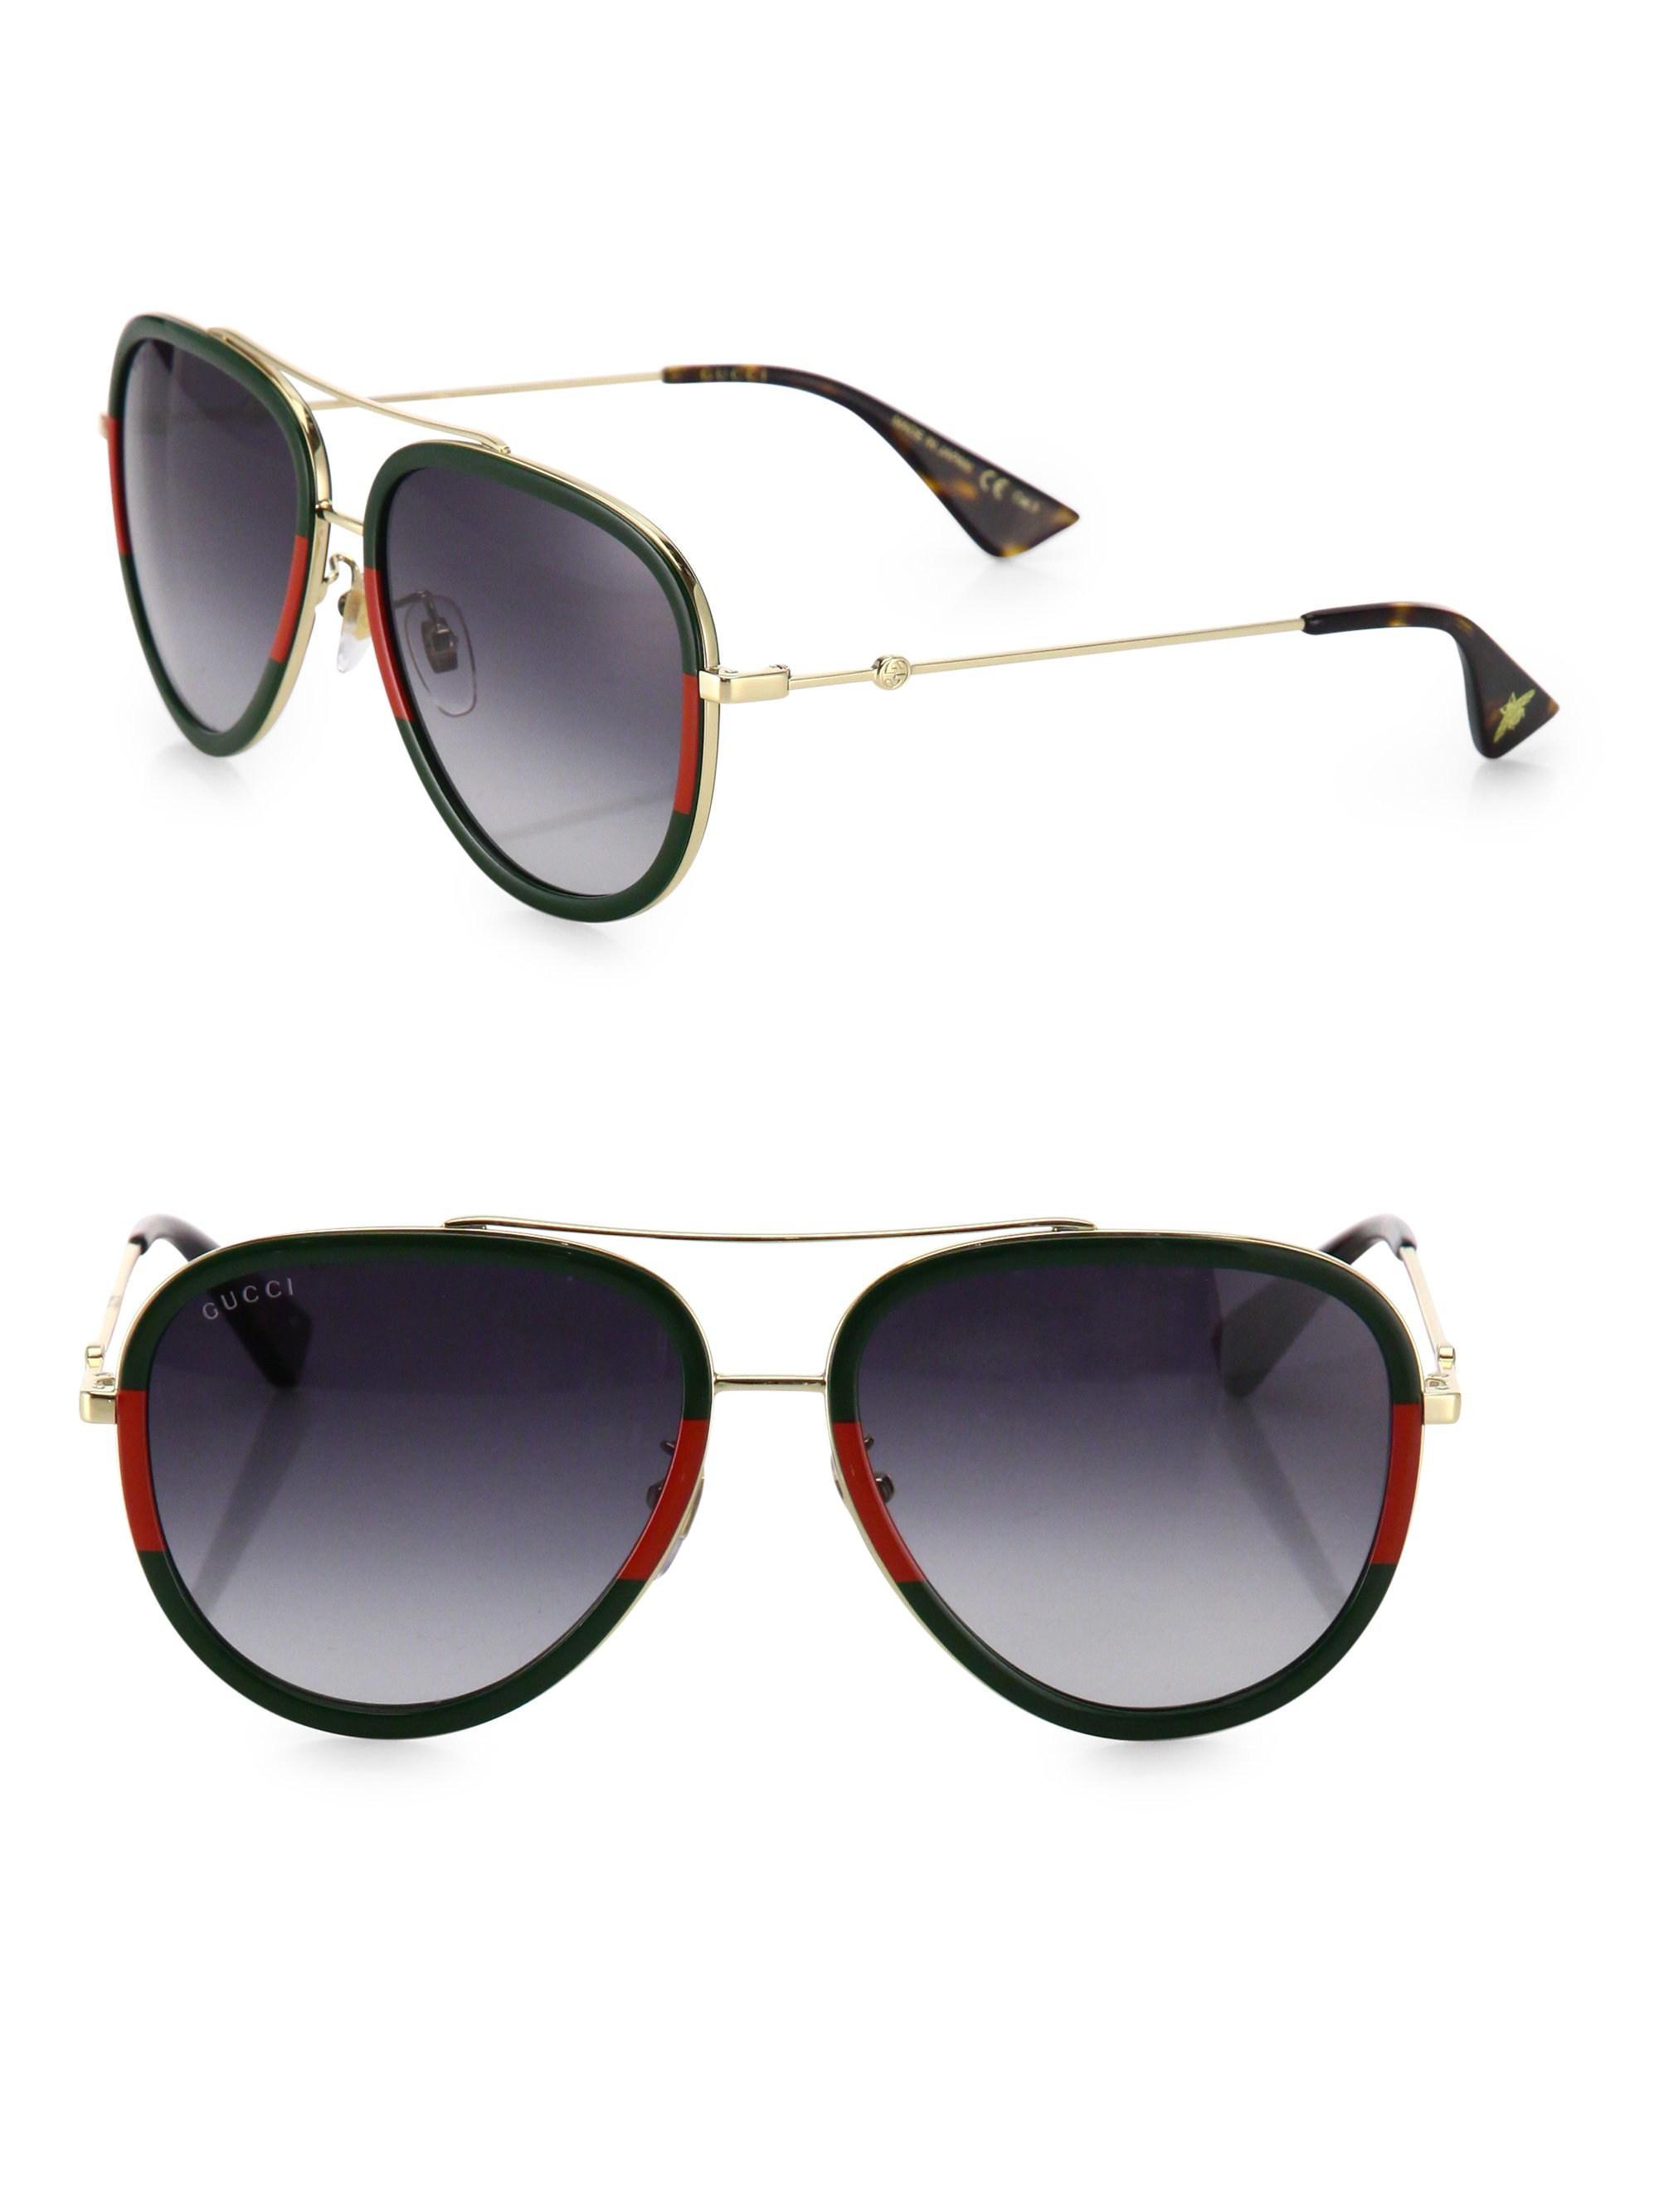 2b8c7879693 Lyst - Gucci 57mm Tortoise Pilot Sunglasses in Metallic for Men